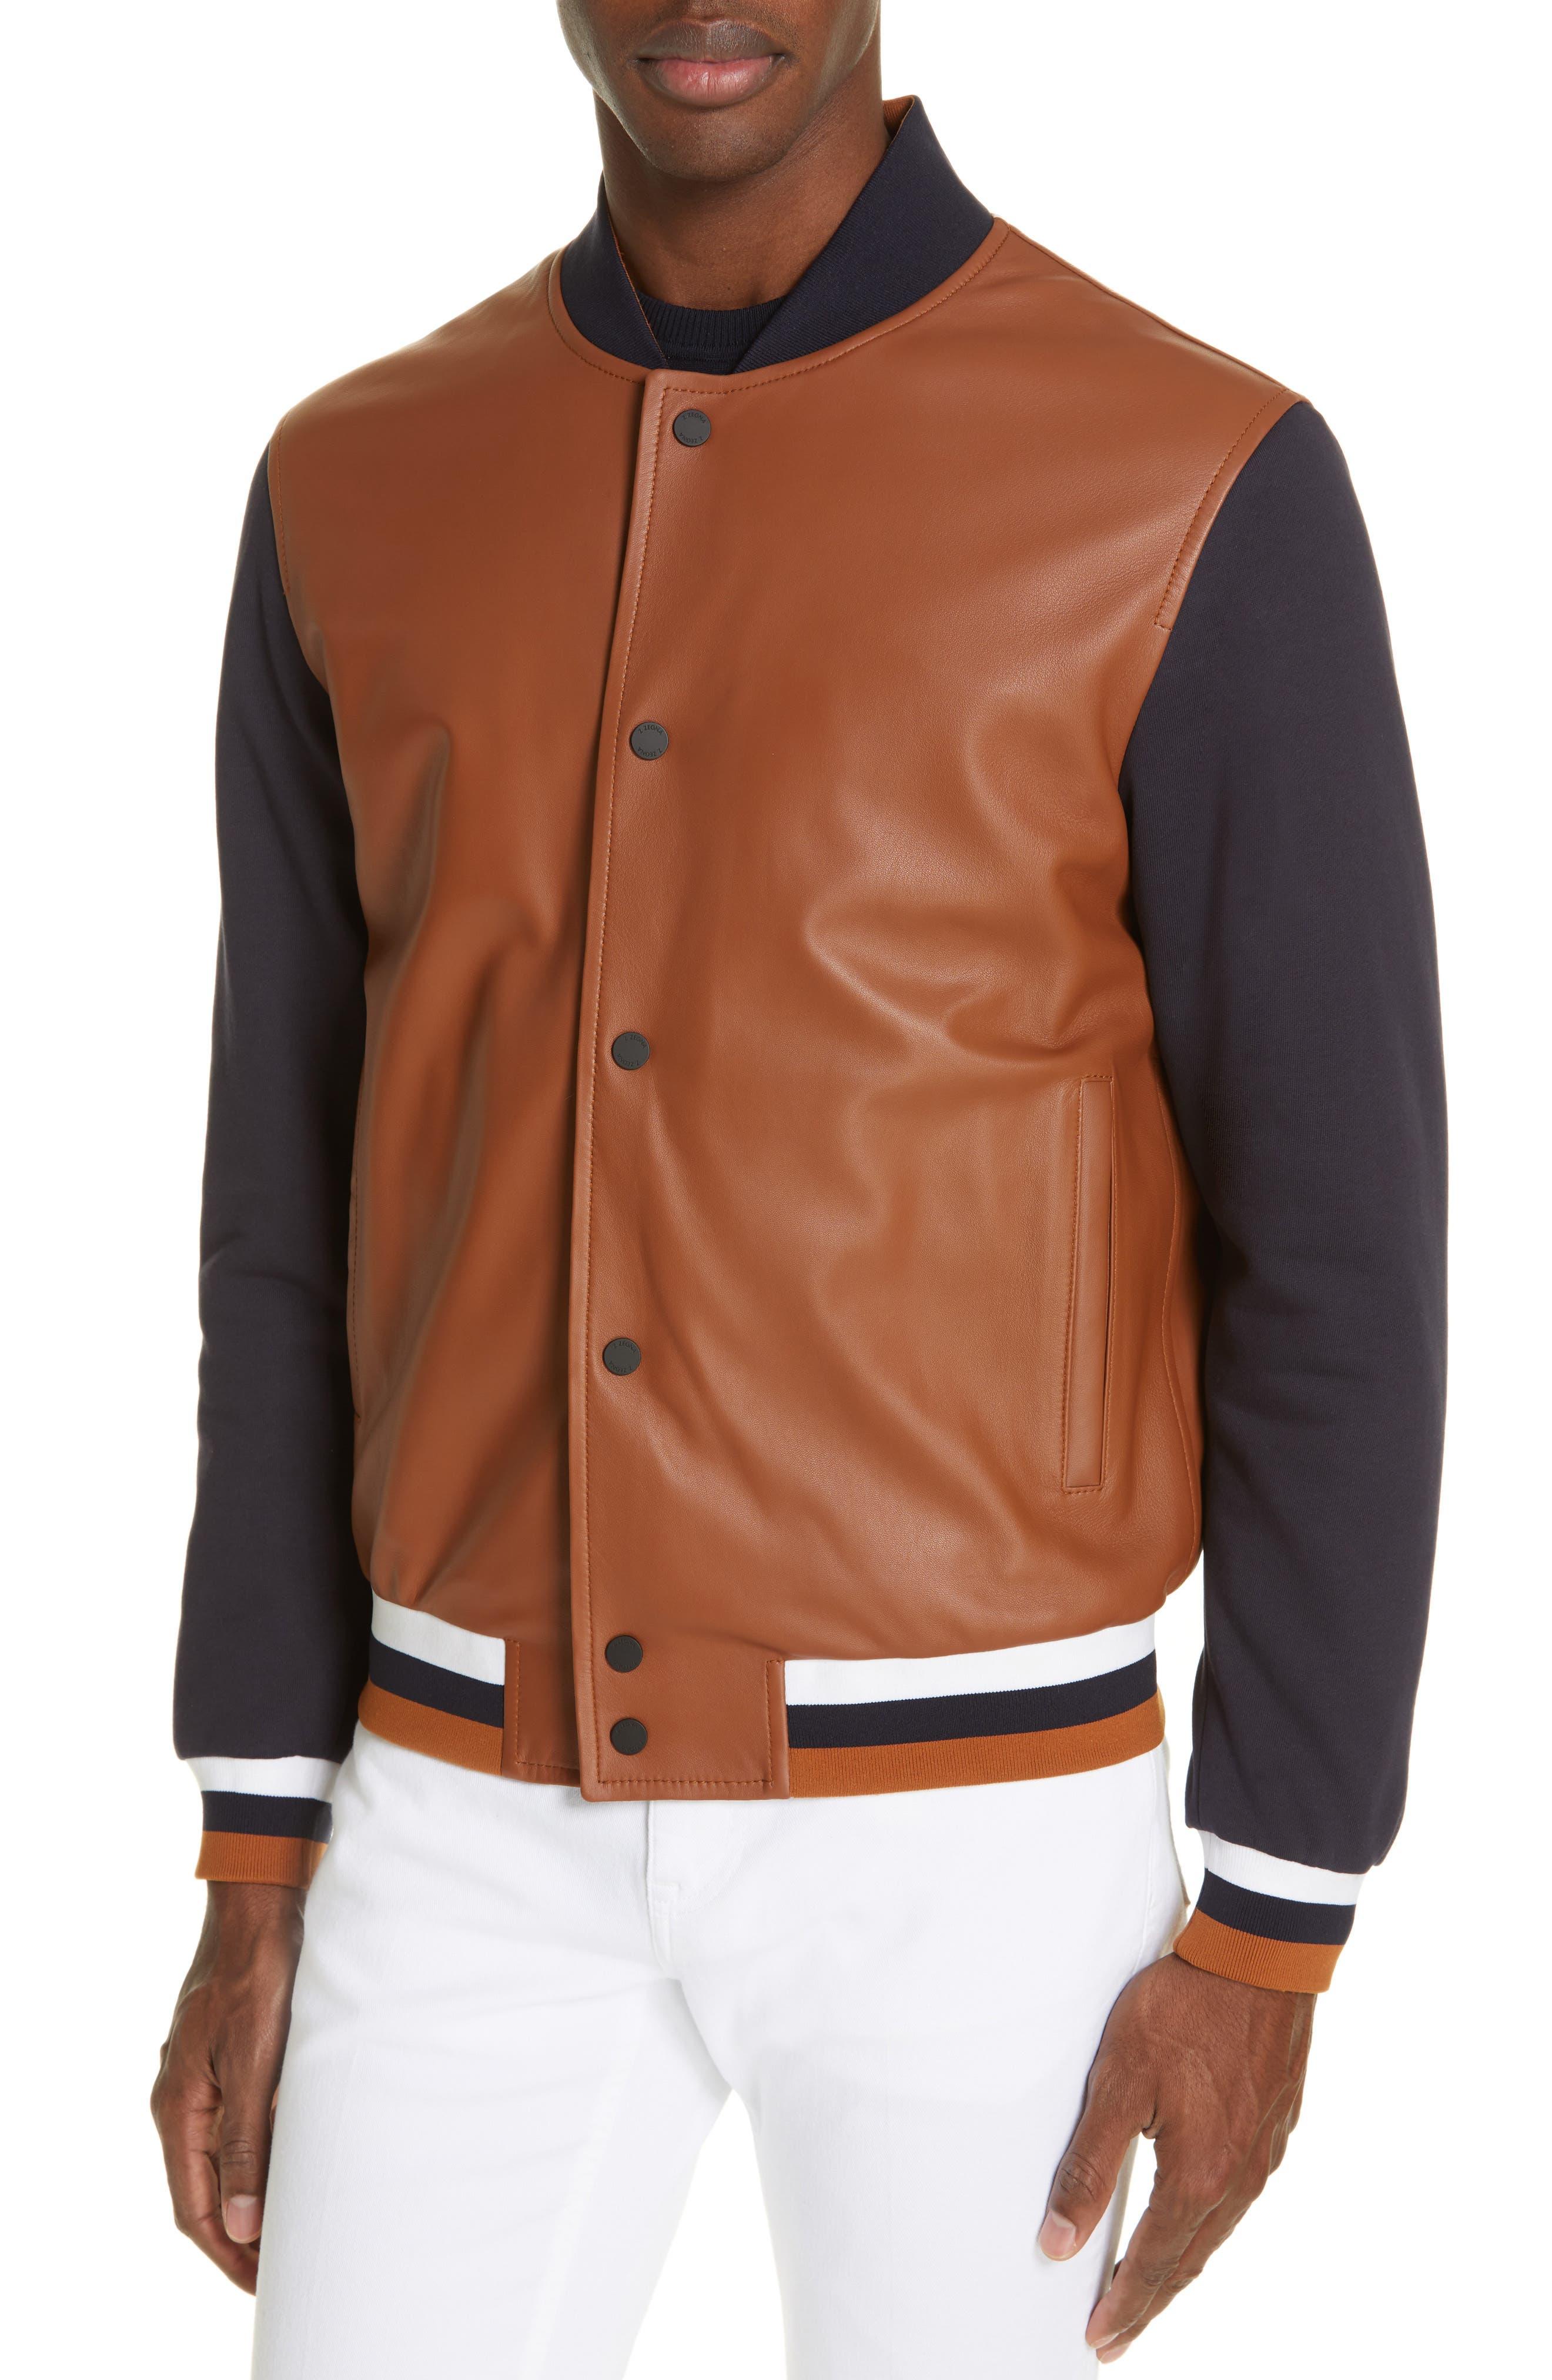 Z ZEGNA, Contrast Leather Bomber Jacket, Alternate thumbnail 4, color, NAVY/ BROWN